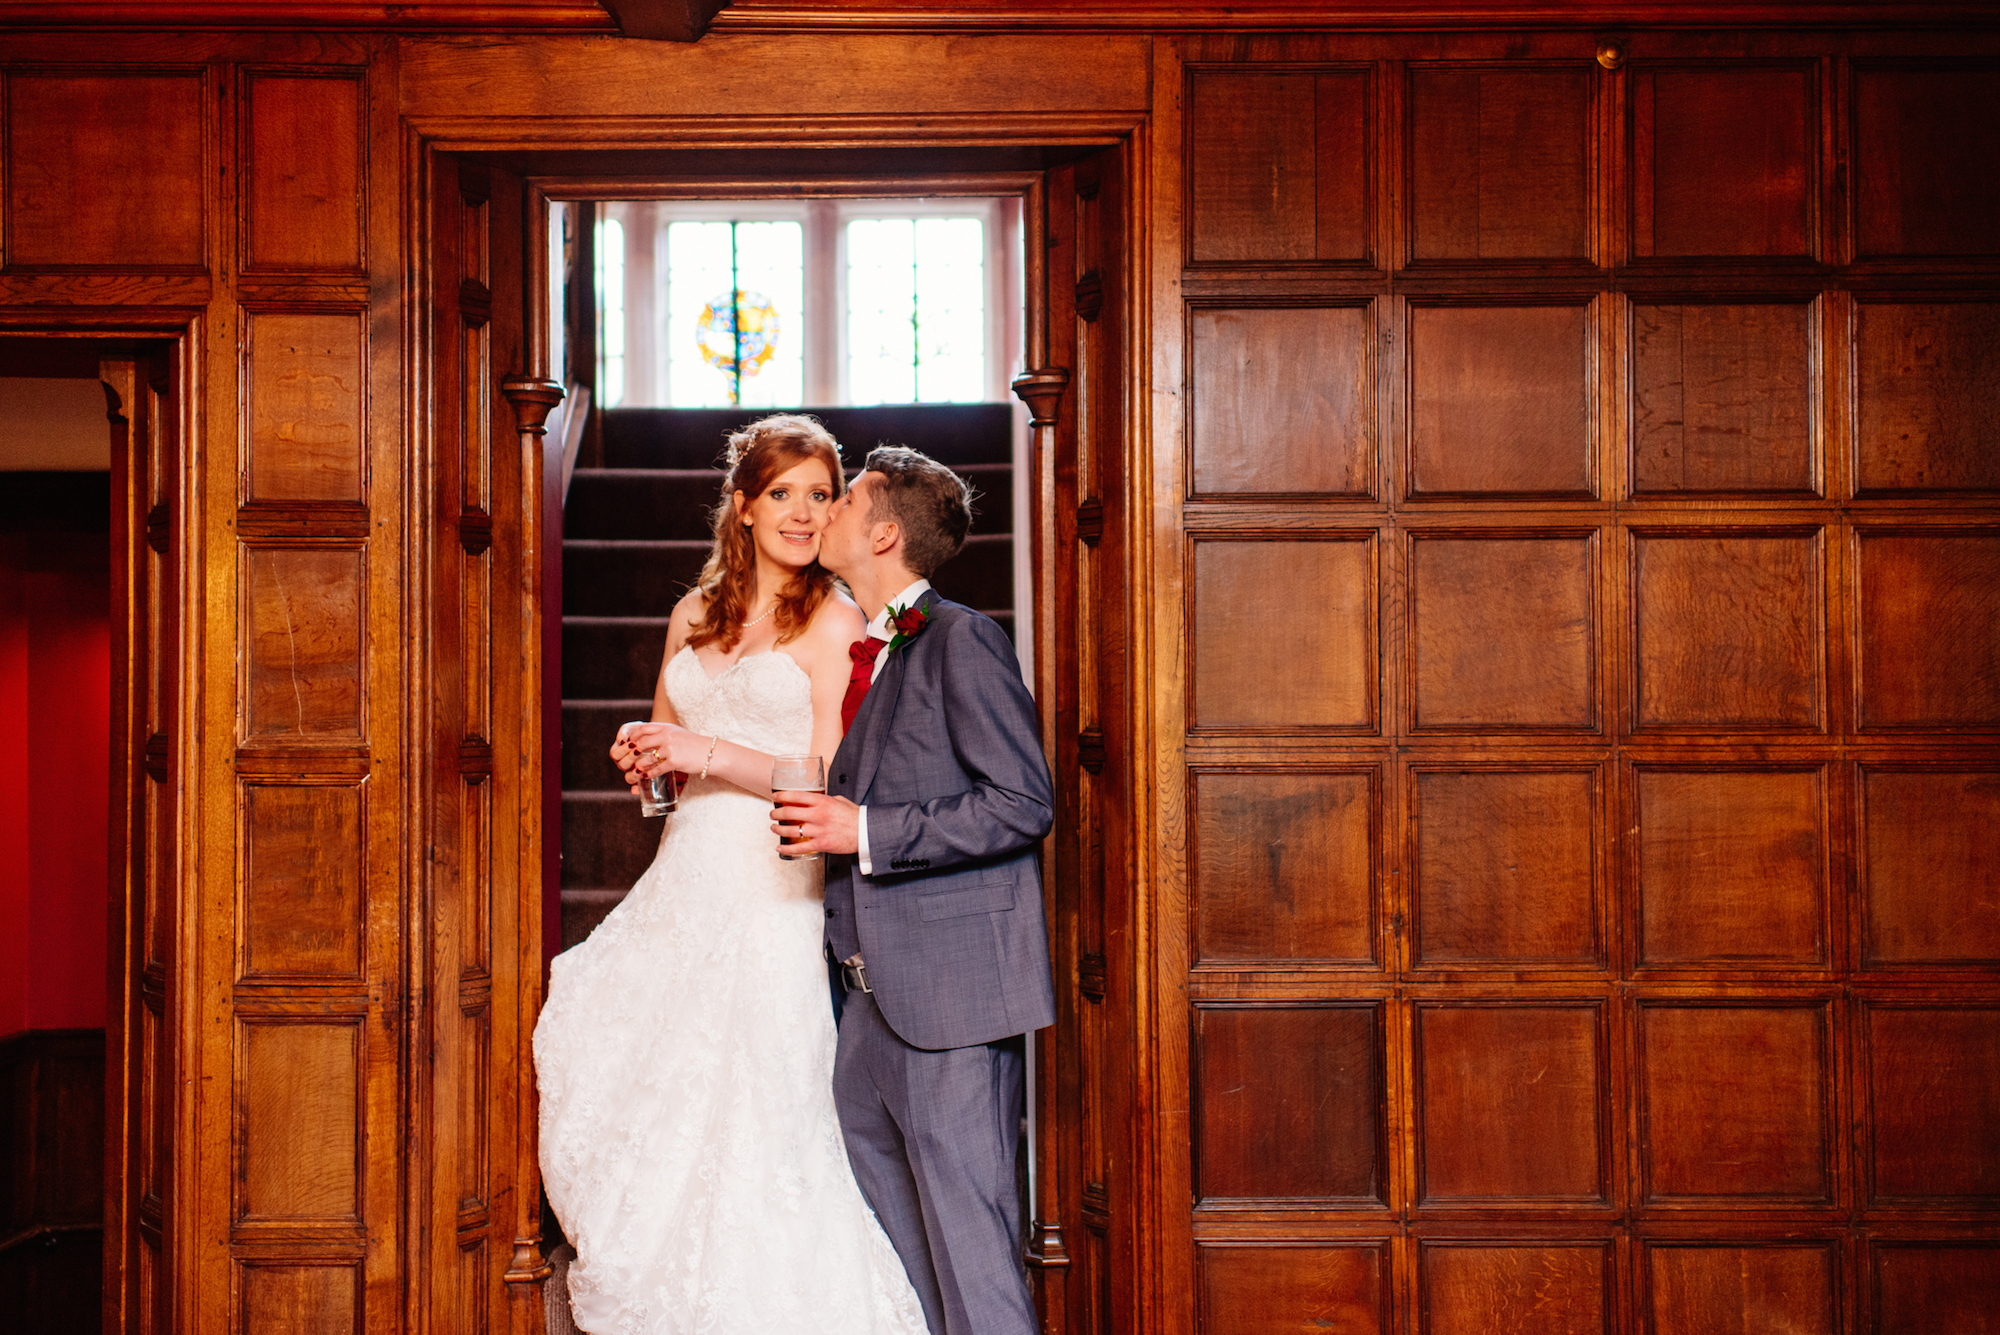 123 Bride Groom London Wedding Photographer Photography.jpg